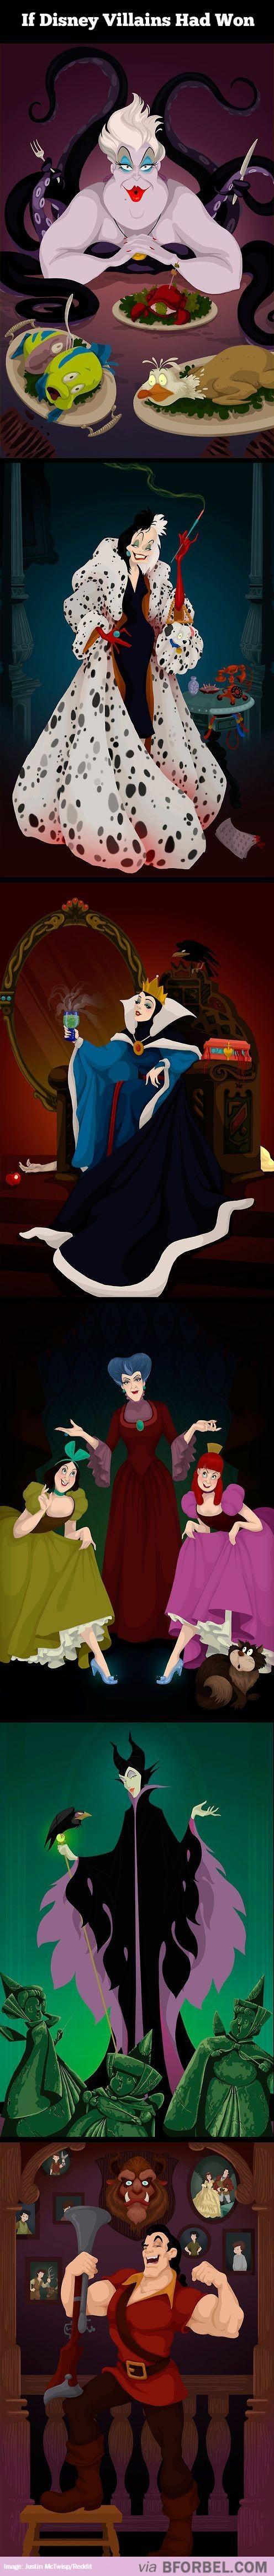 6 Disney Villains Getting Their Happy Ending…